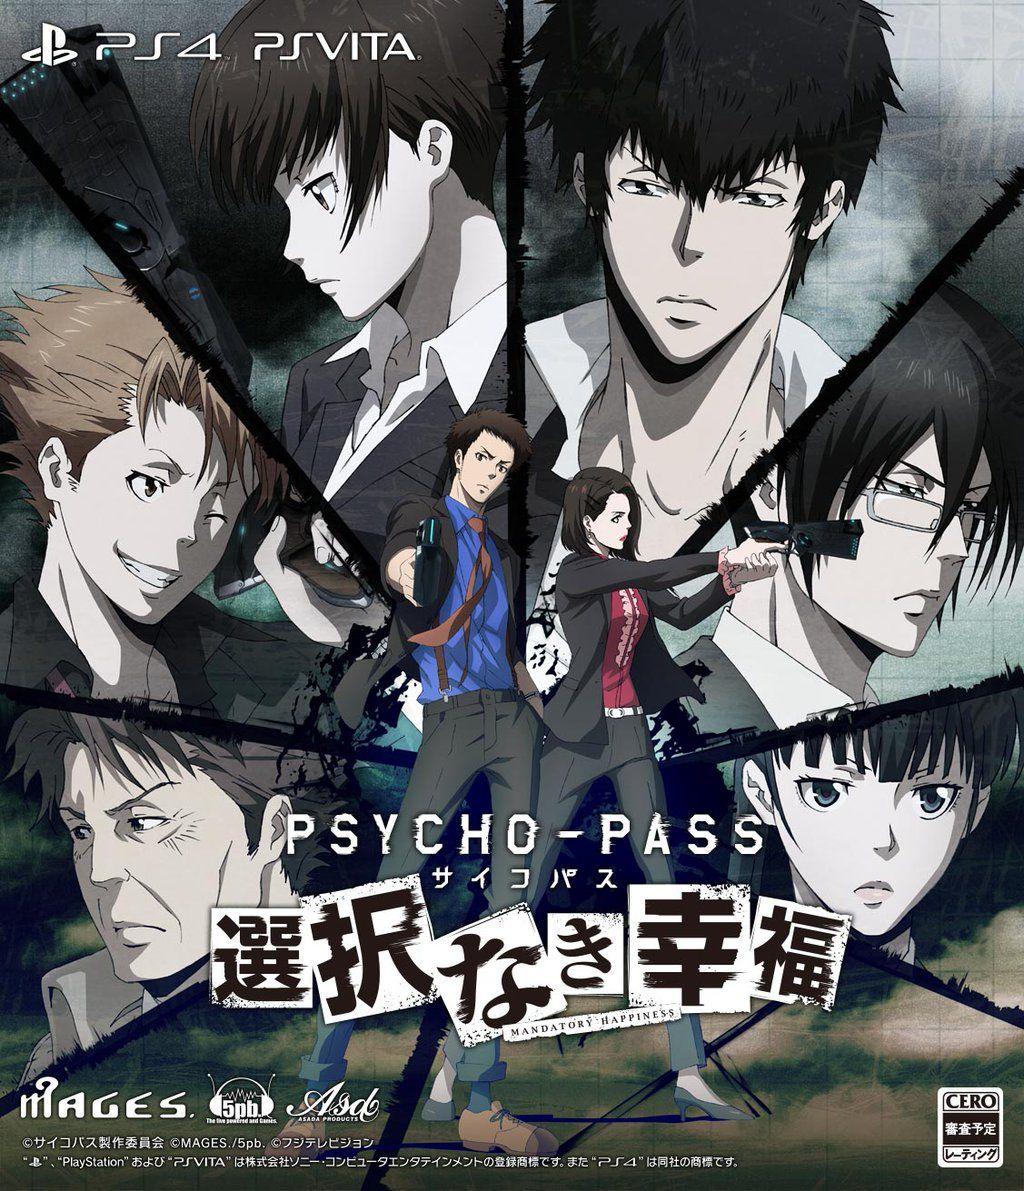 Psycho pass visual novel